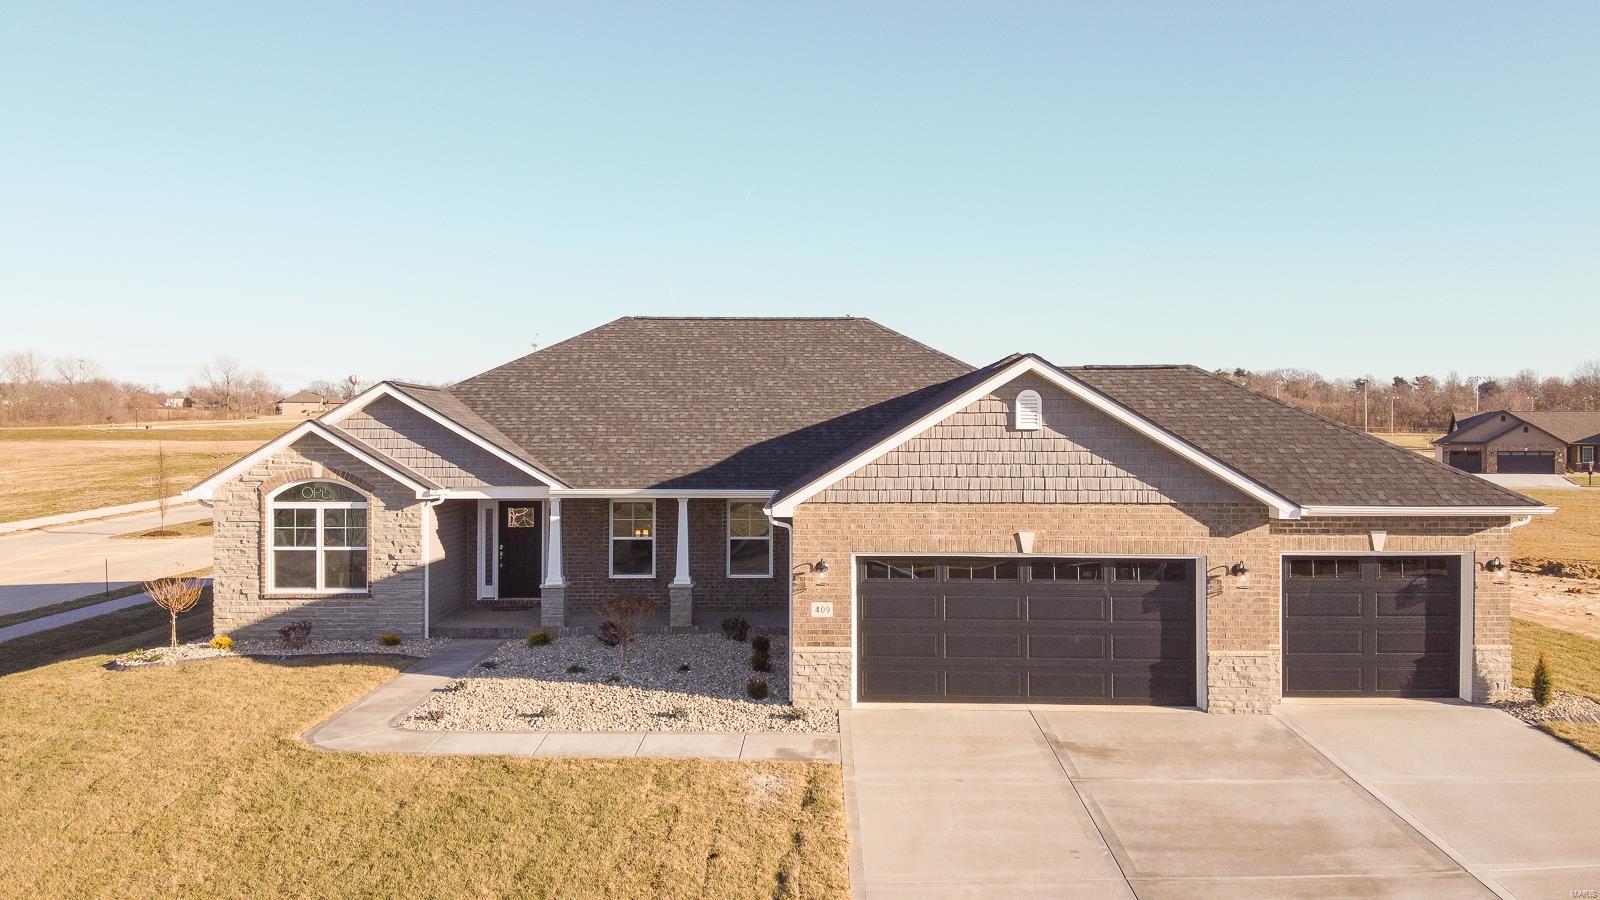 409 Sage Drive, Shiloh, IL 62221